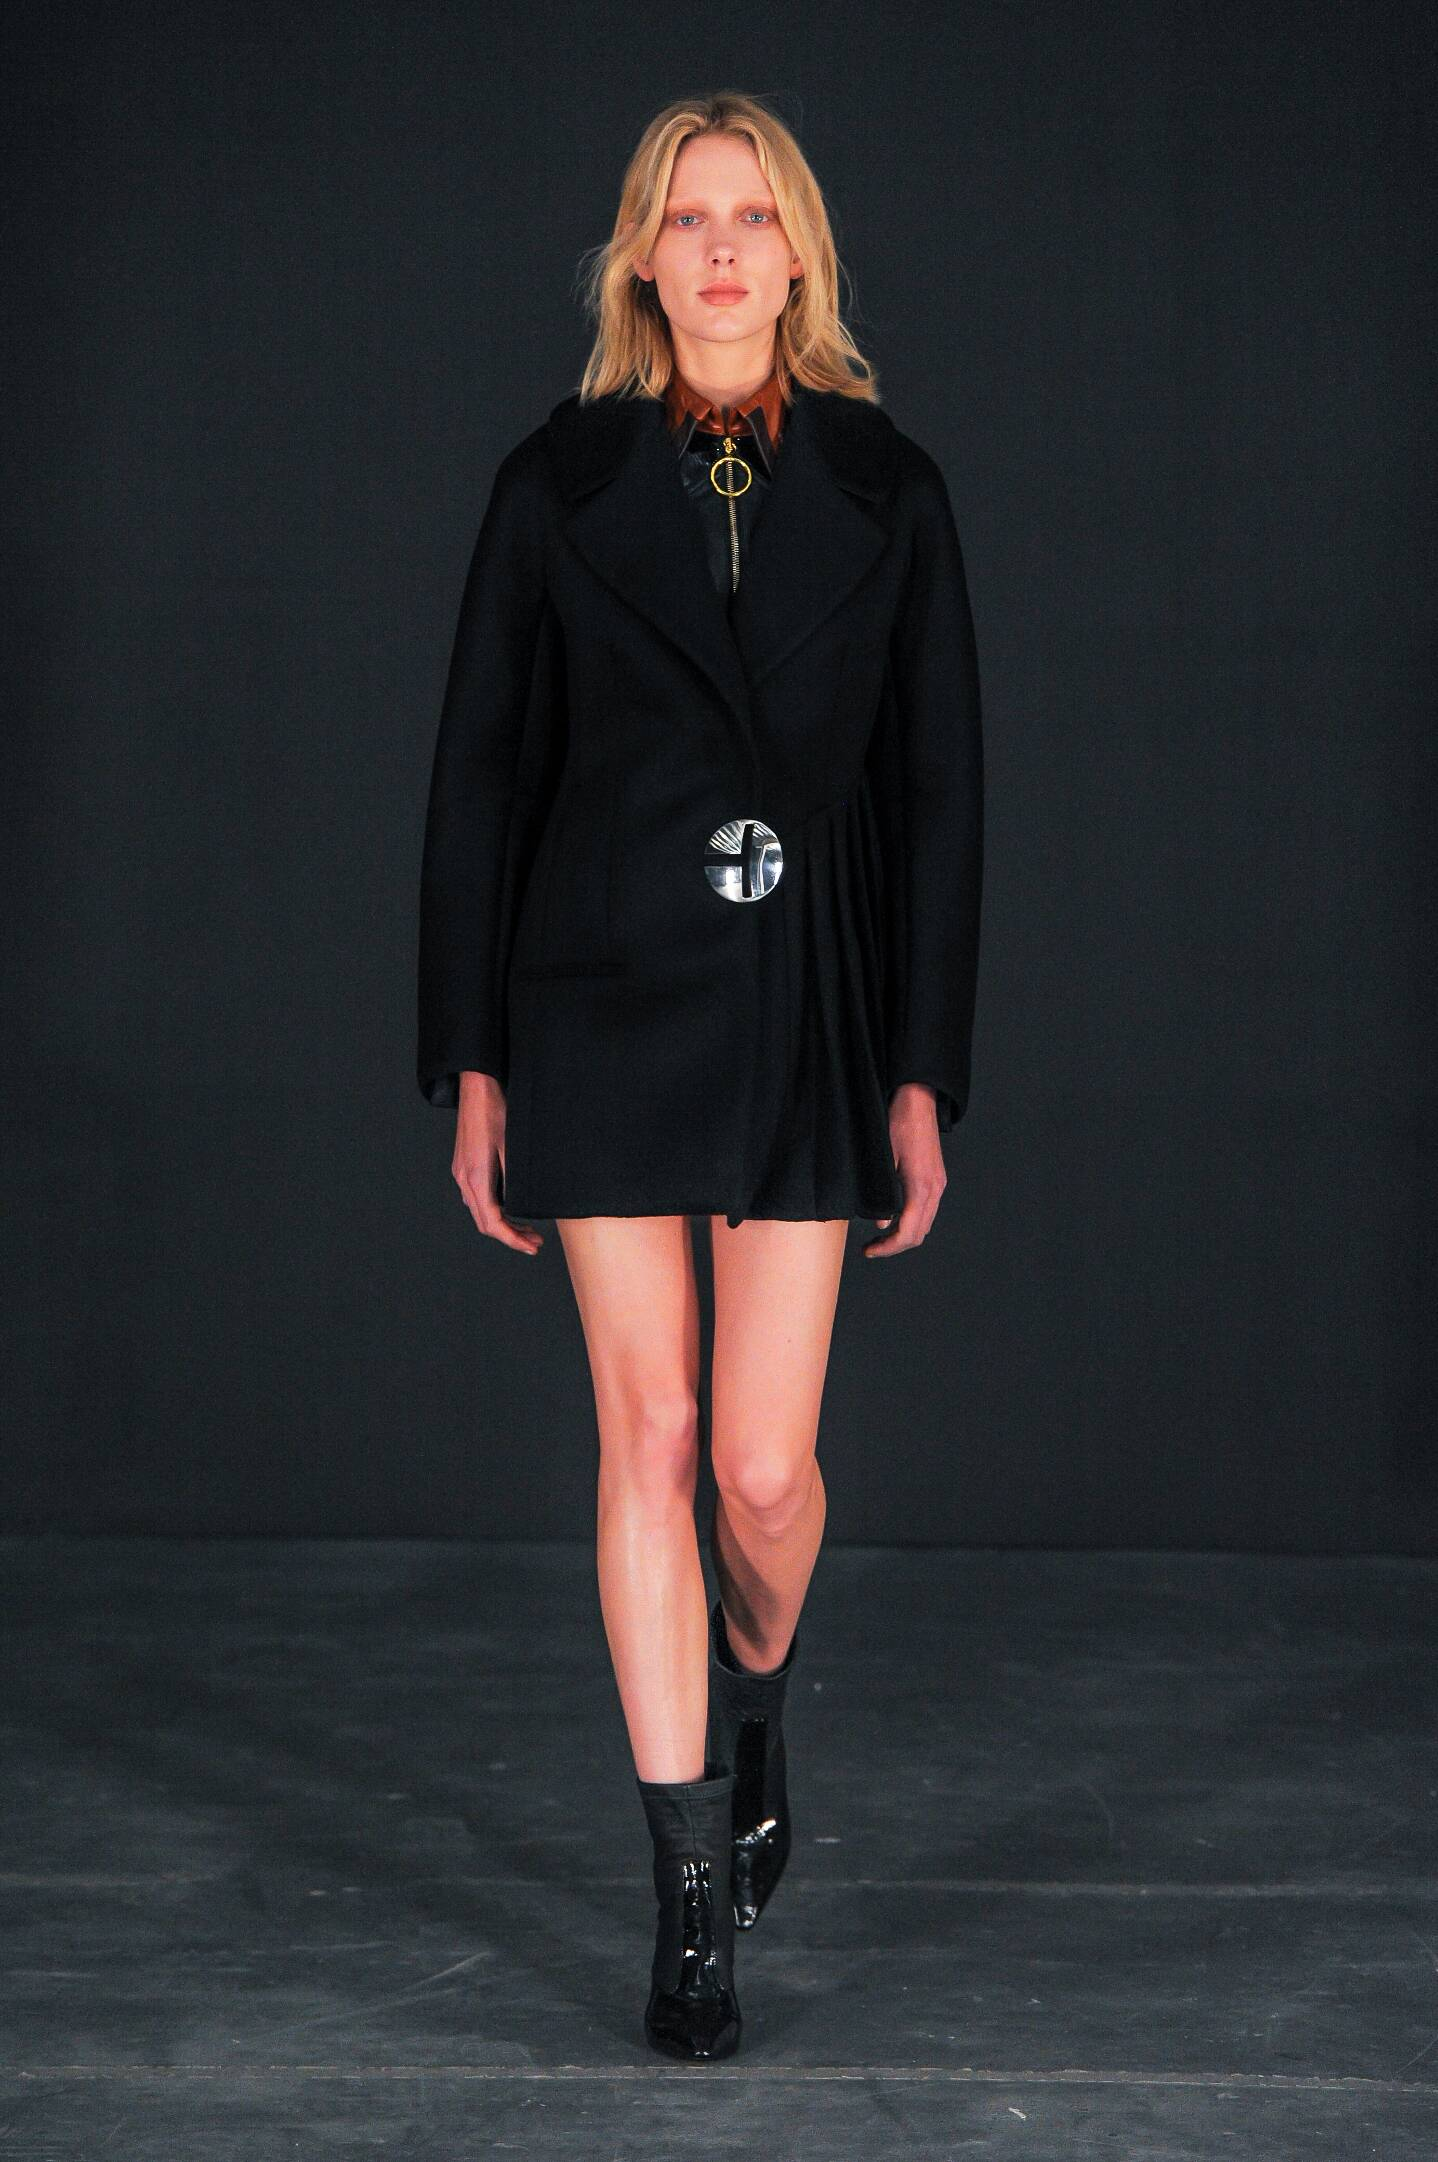 Fall Fashion Woman Thomas Tait Collection